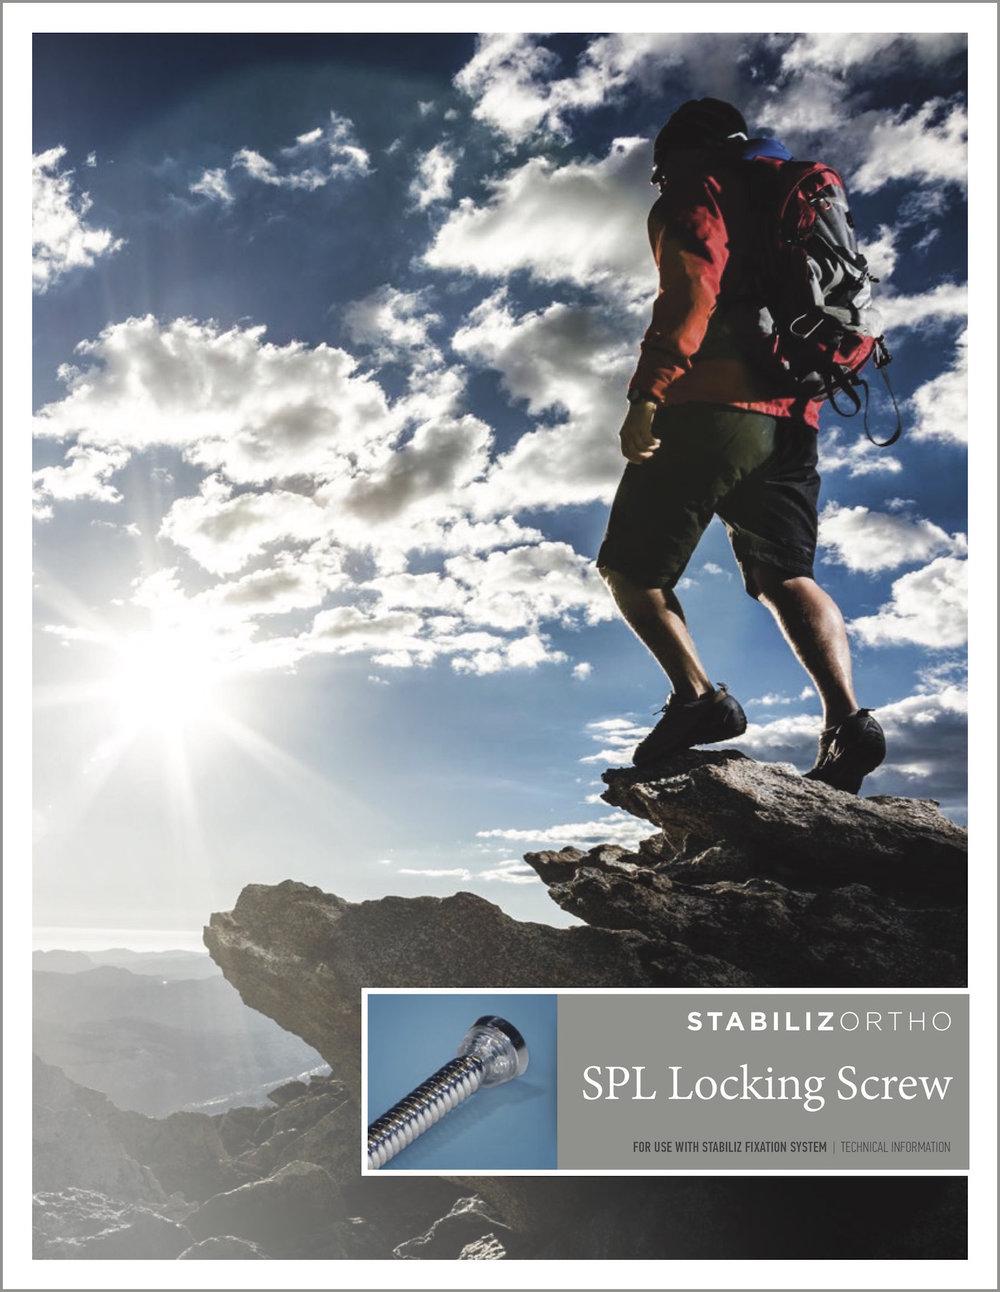 SPL Technical Information